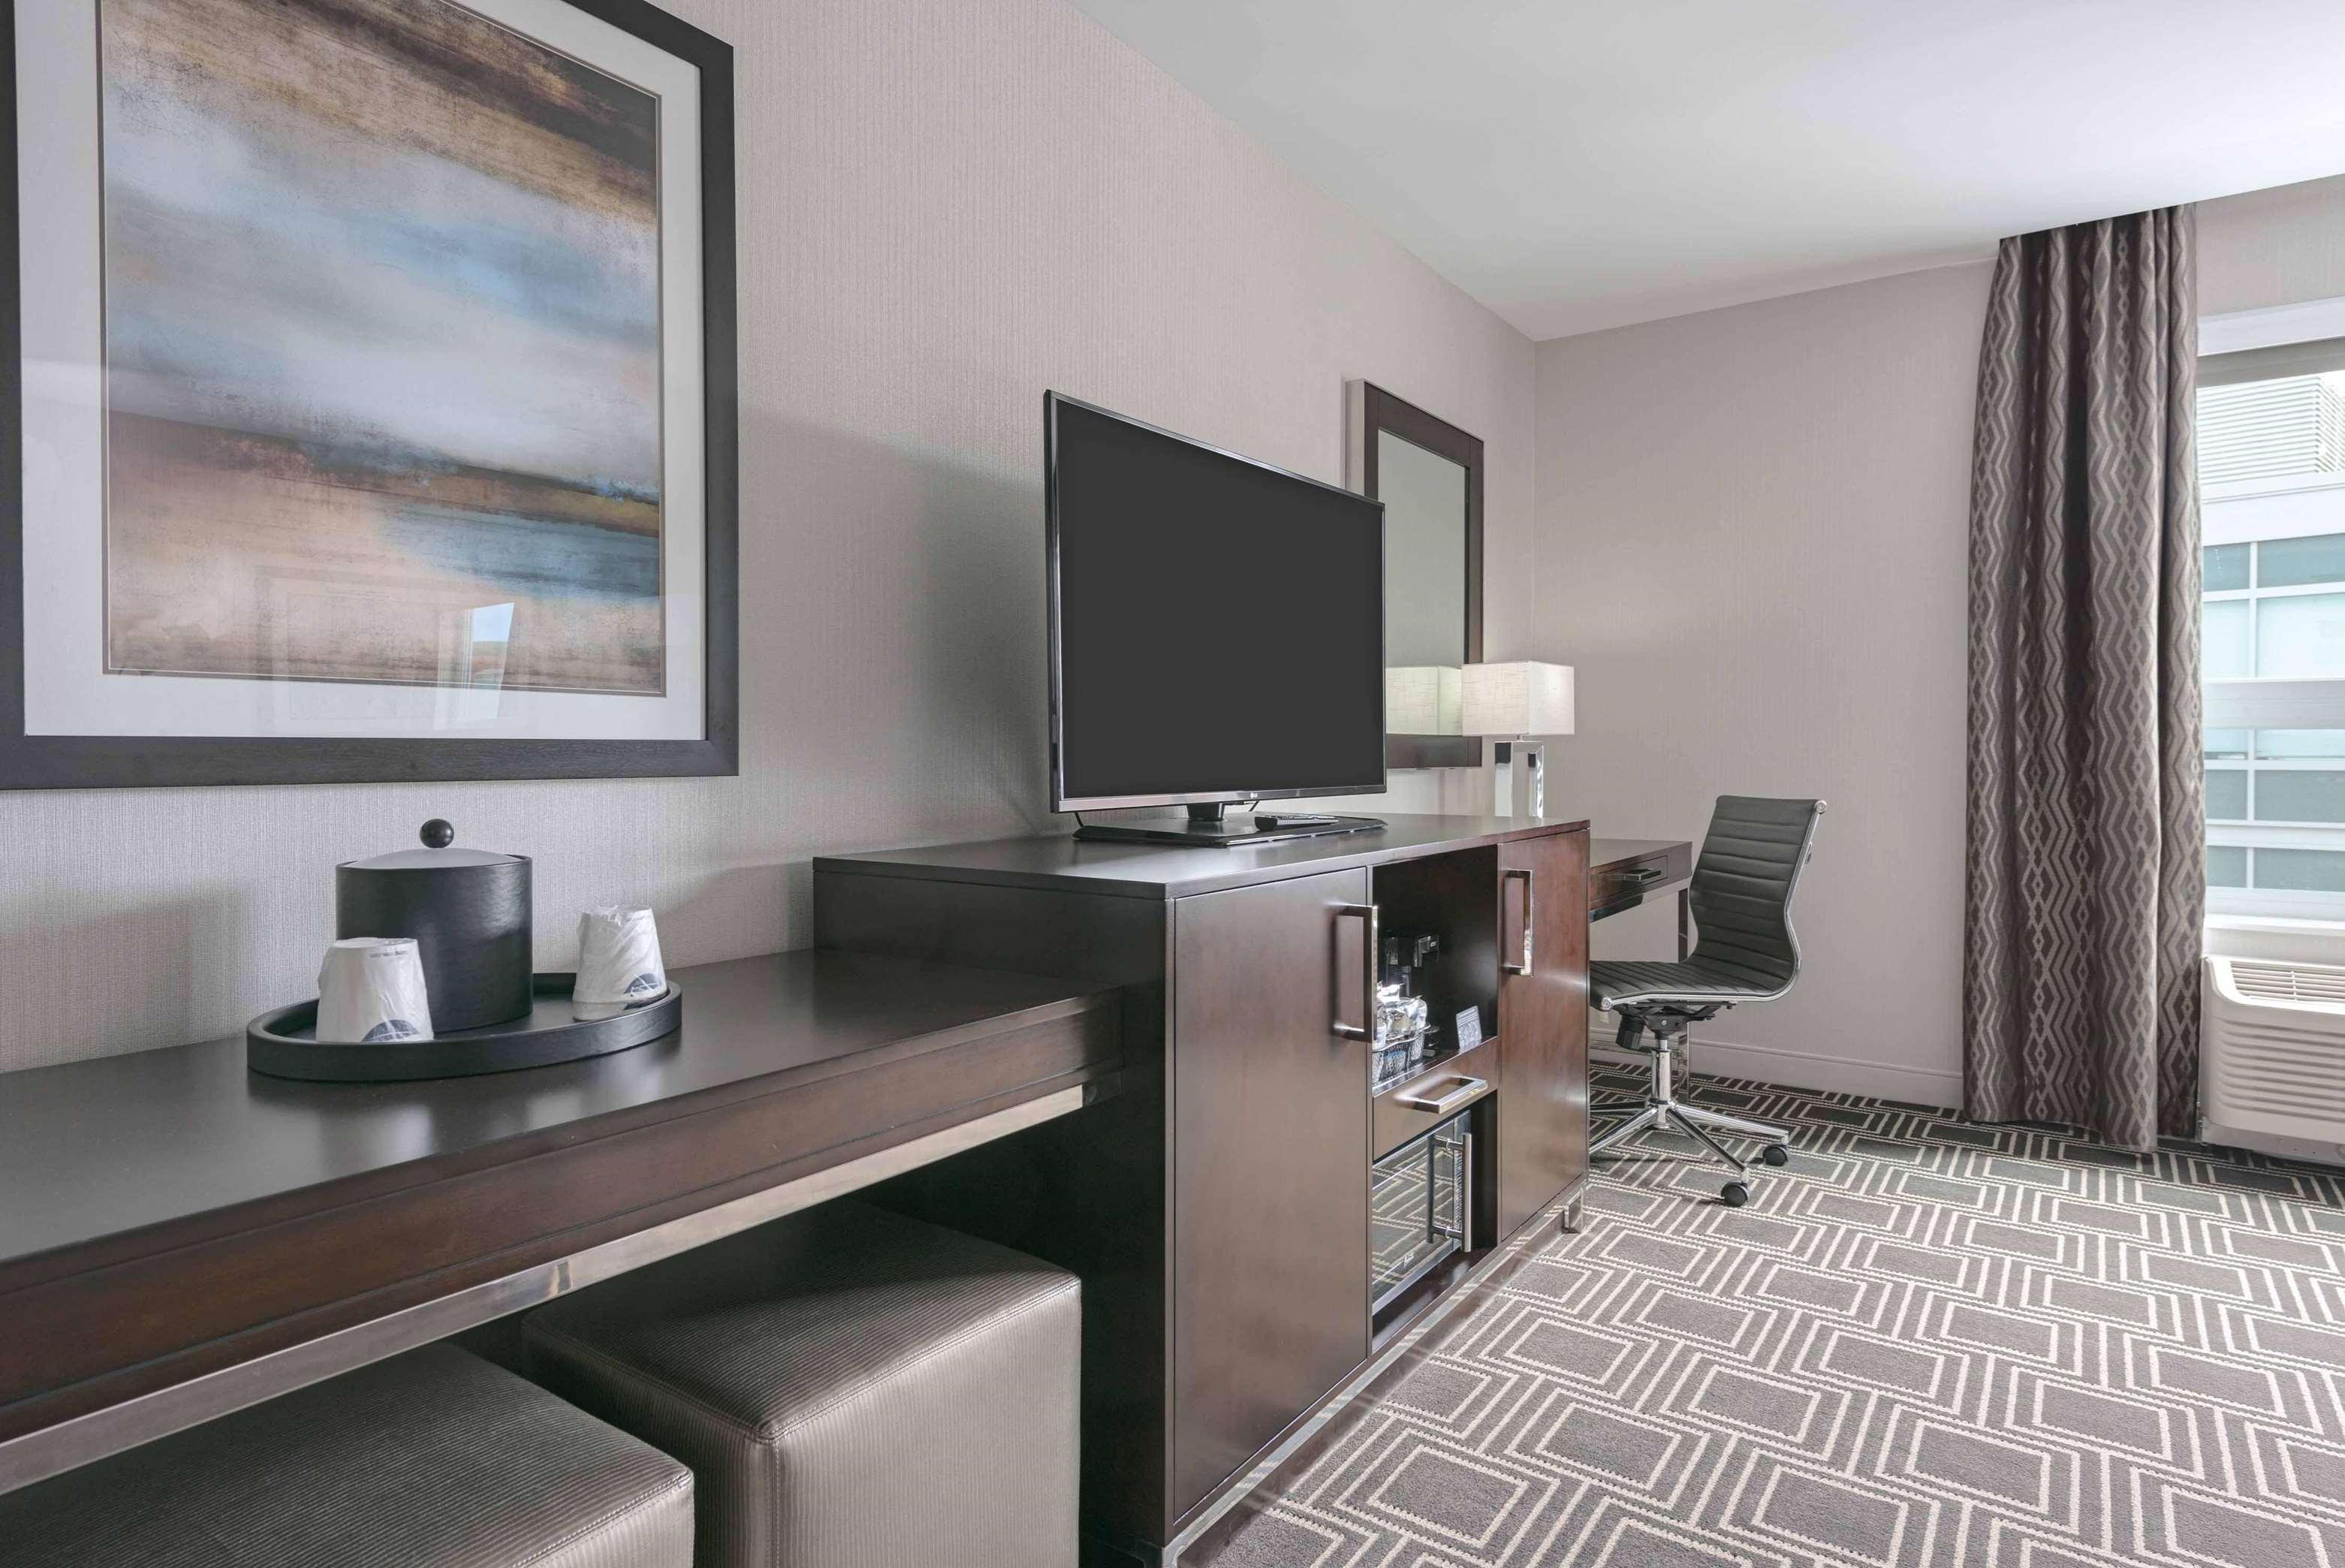 Hampton Inn & Suites Worcester image 14